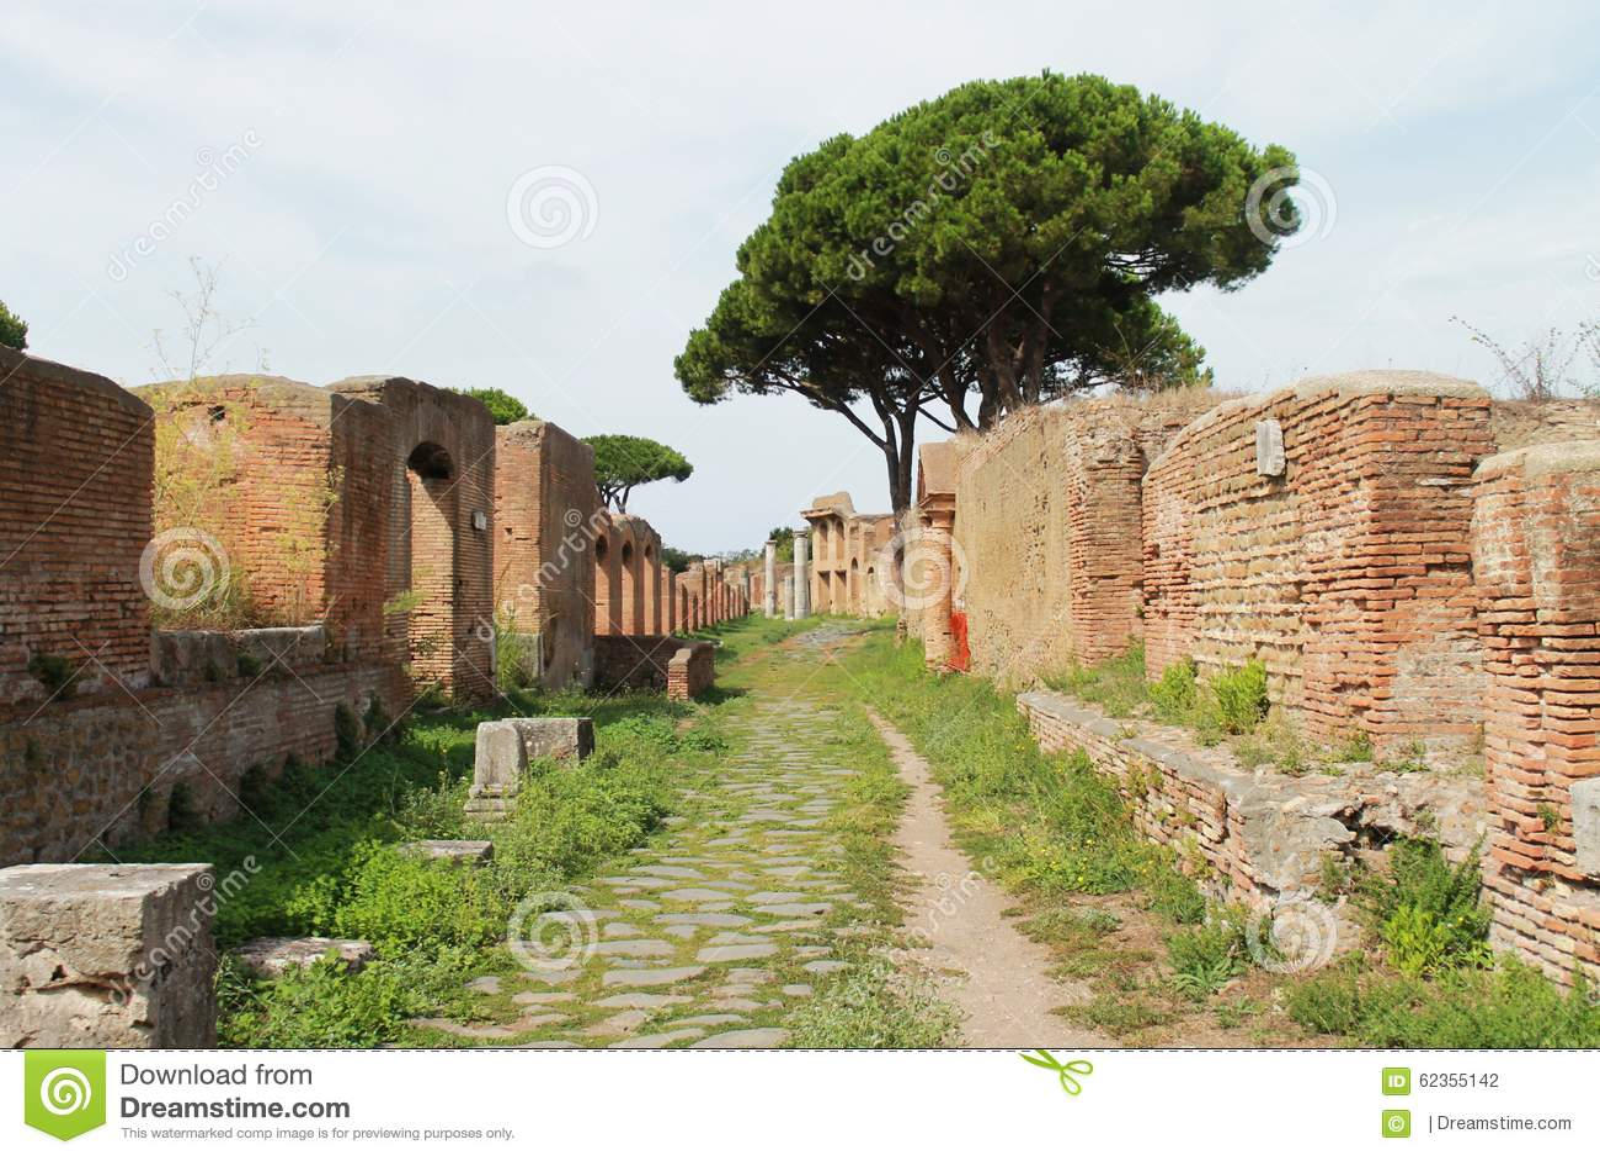 Street view stock photo image 62355142 for Mr arredamenti ostia antica